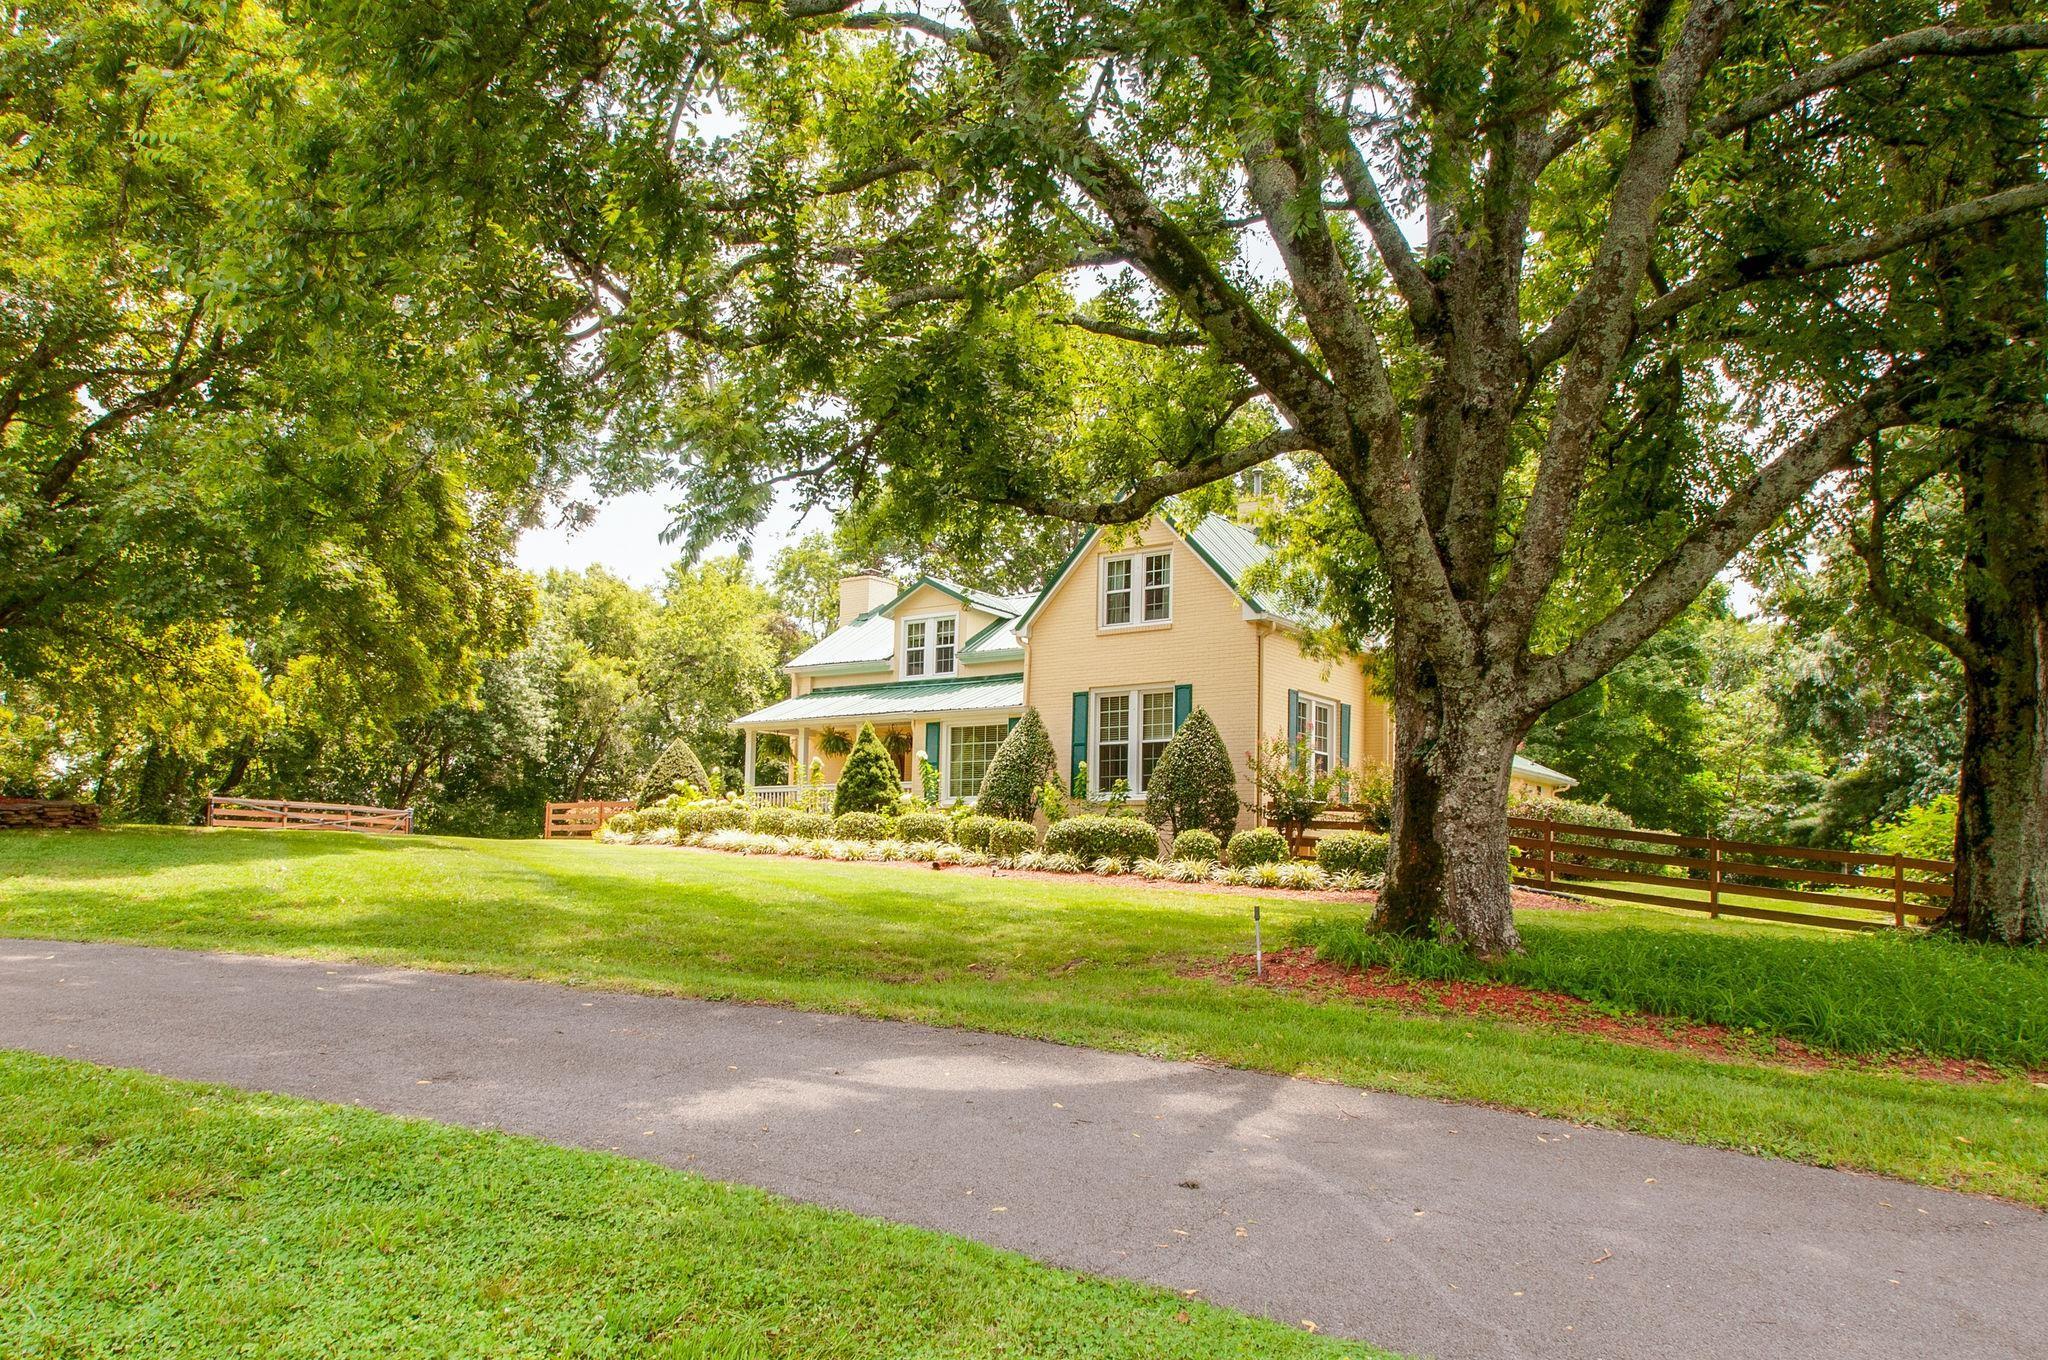 5330 Weber Rd, Hermitage, TN 37076 - Hermitage, TN real estate listing